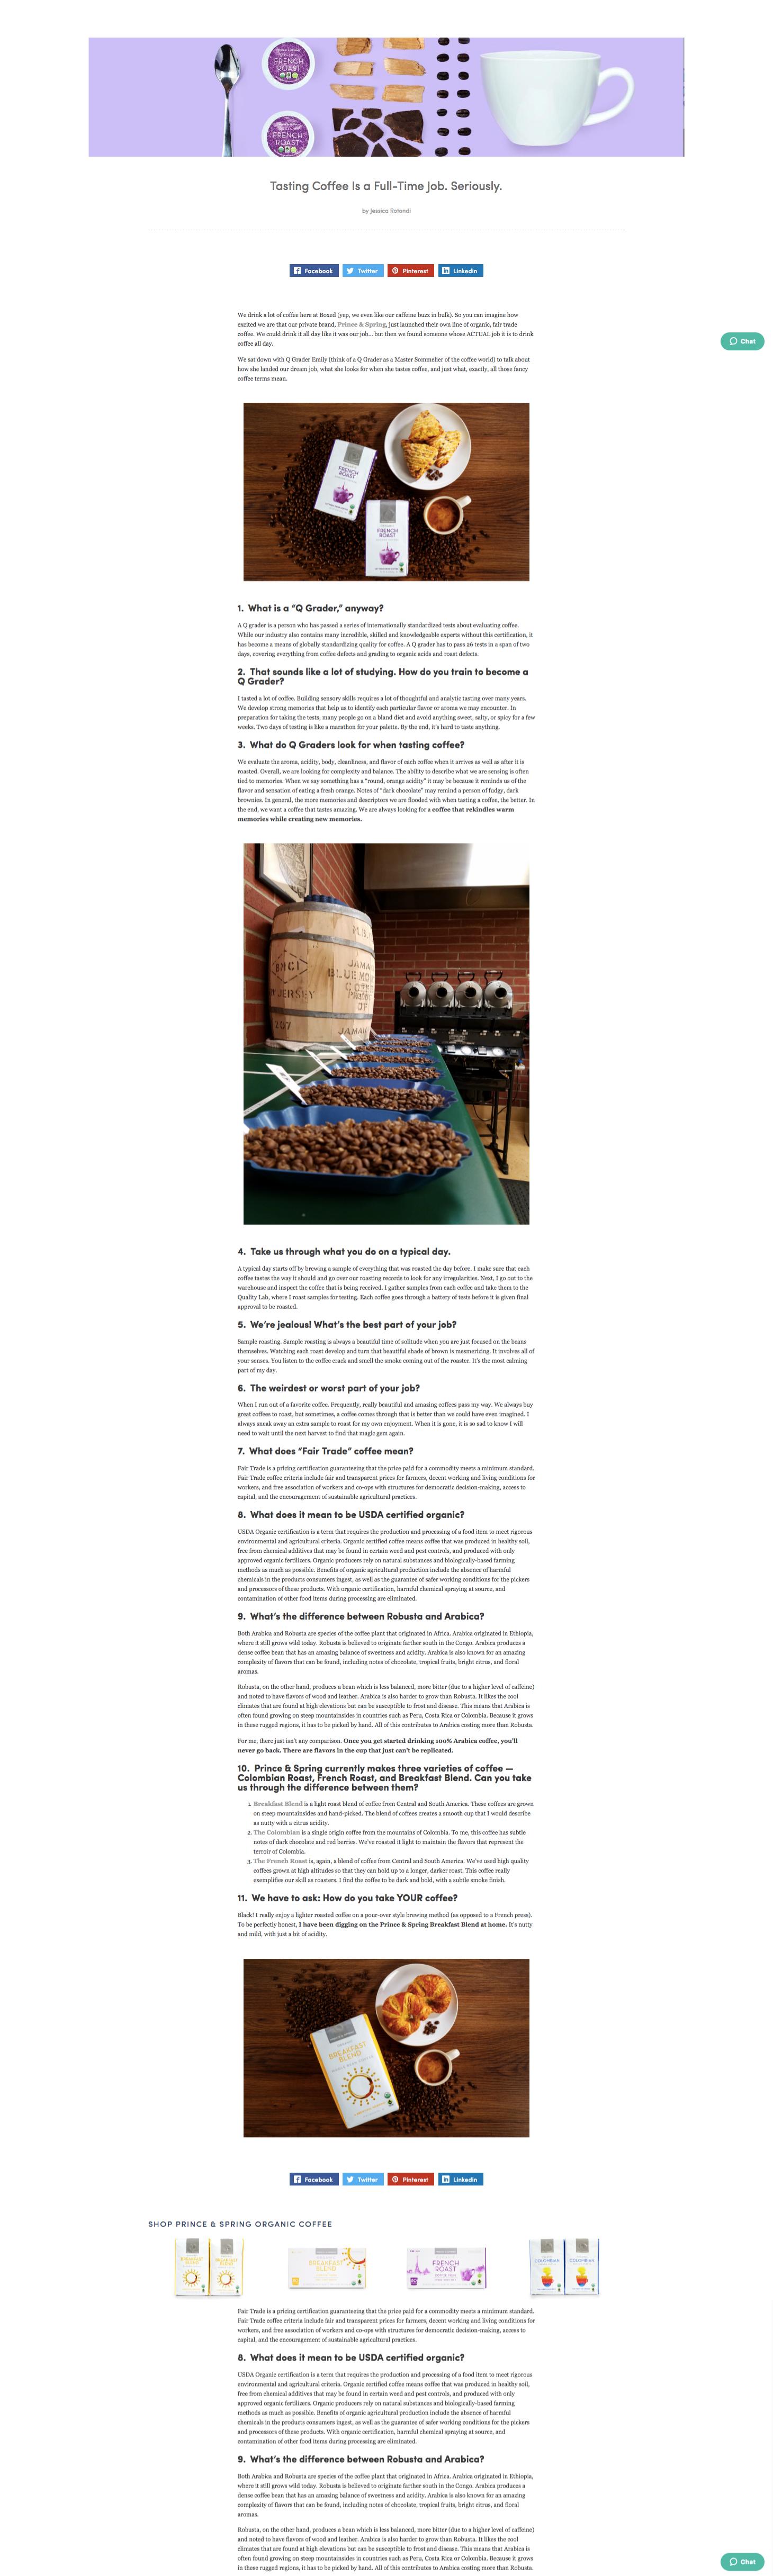 screencapture-boxed-blog-coffee-tasting-2018-12-05-18_43_37.png